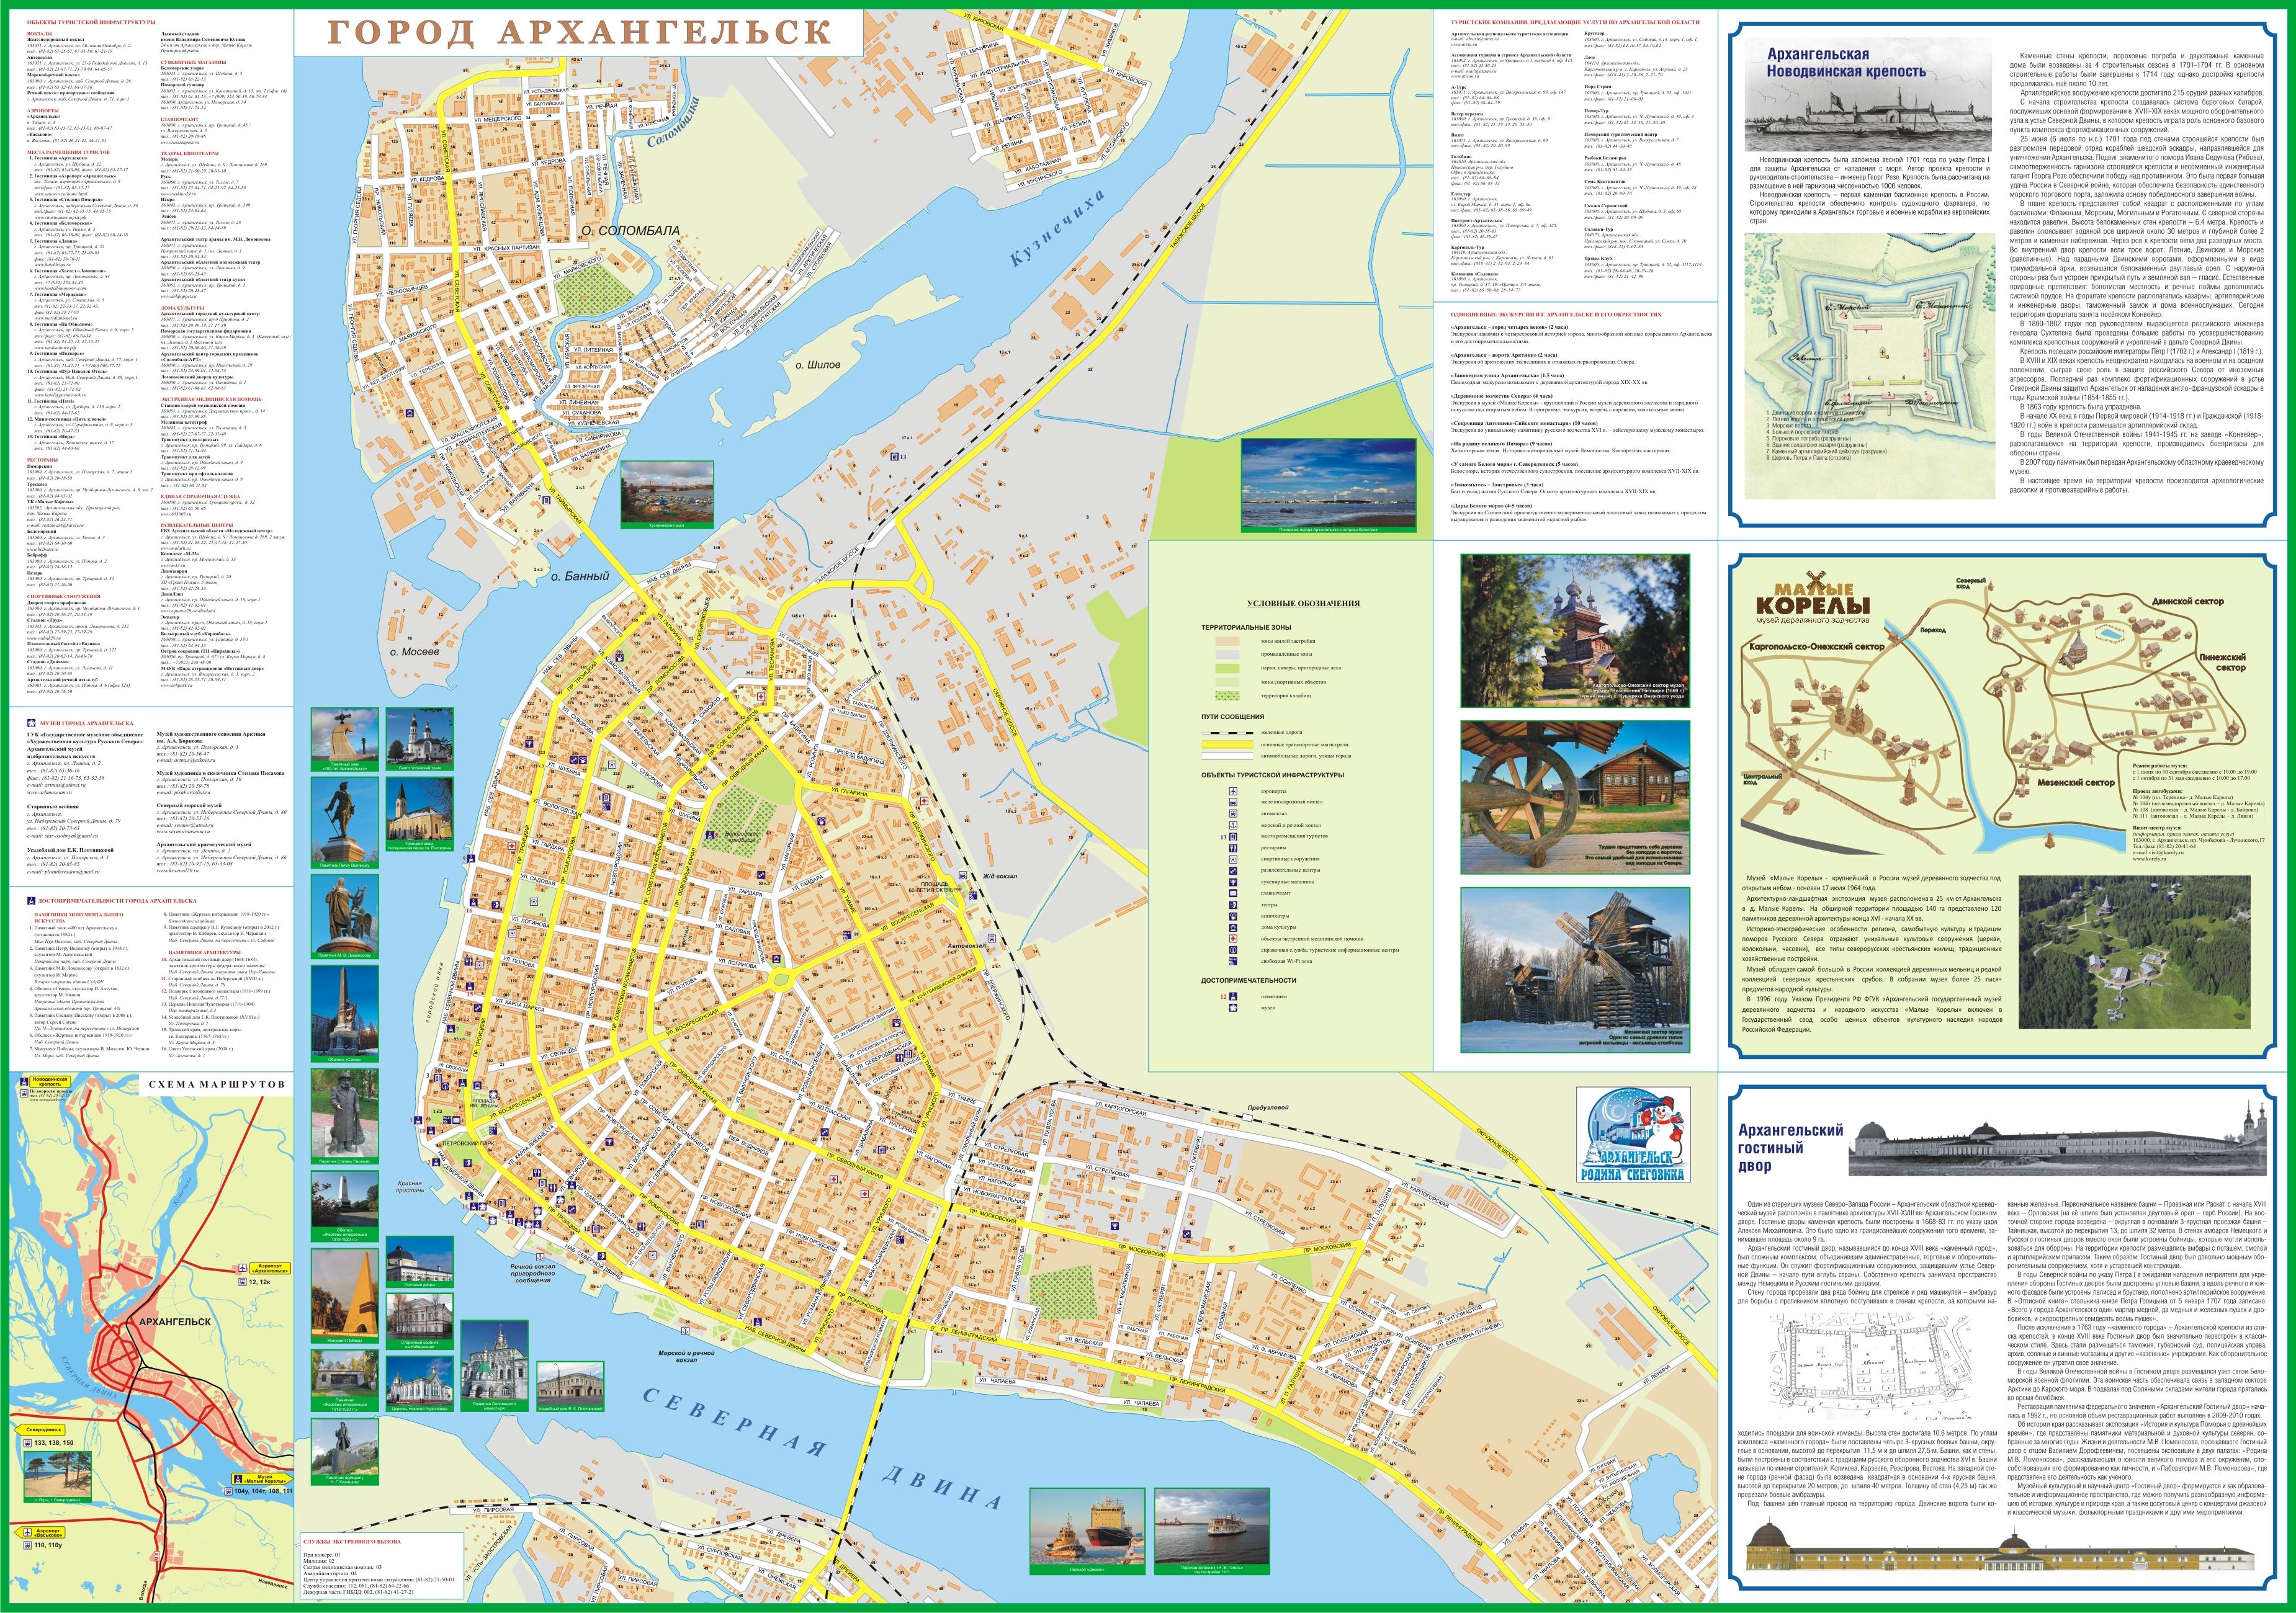 Схема г архангельск: http://schmhlpr.appspot.com/shema-g-arhangelsk.html